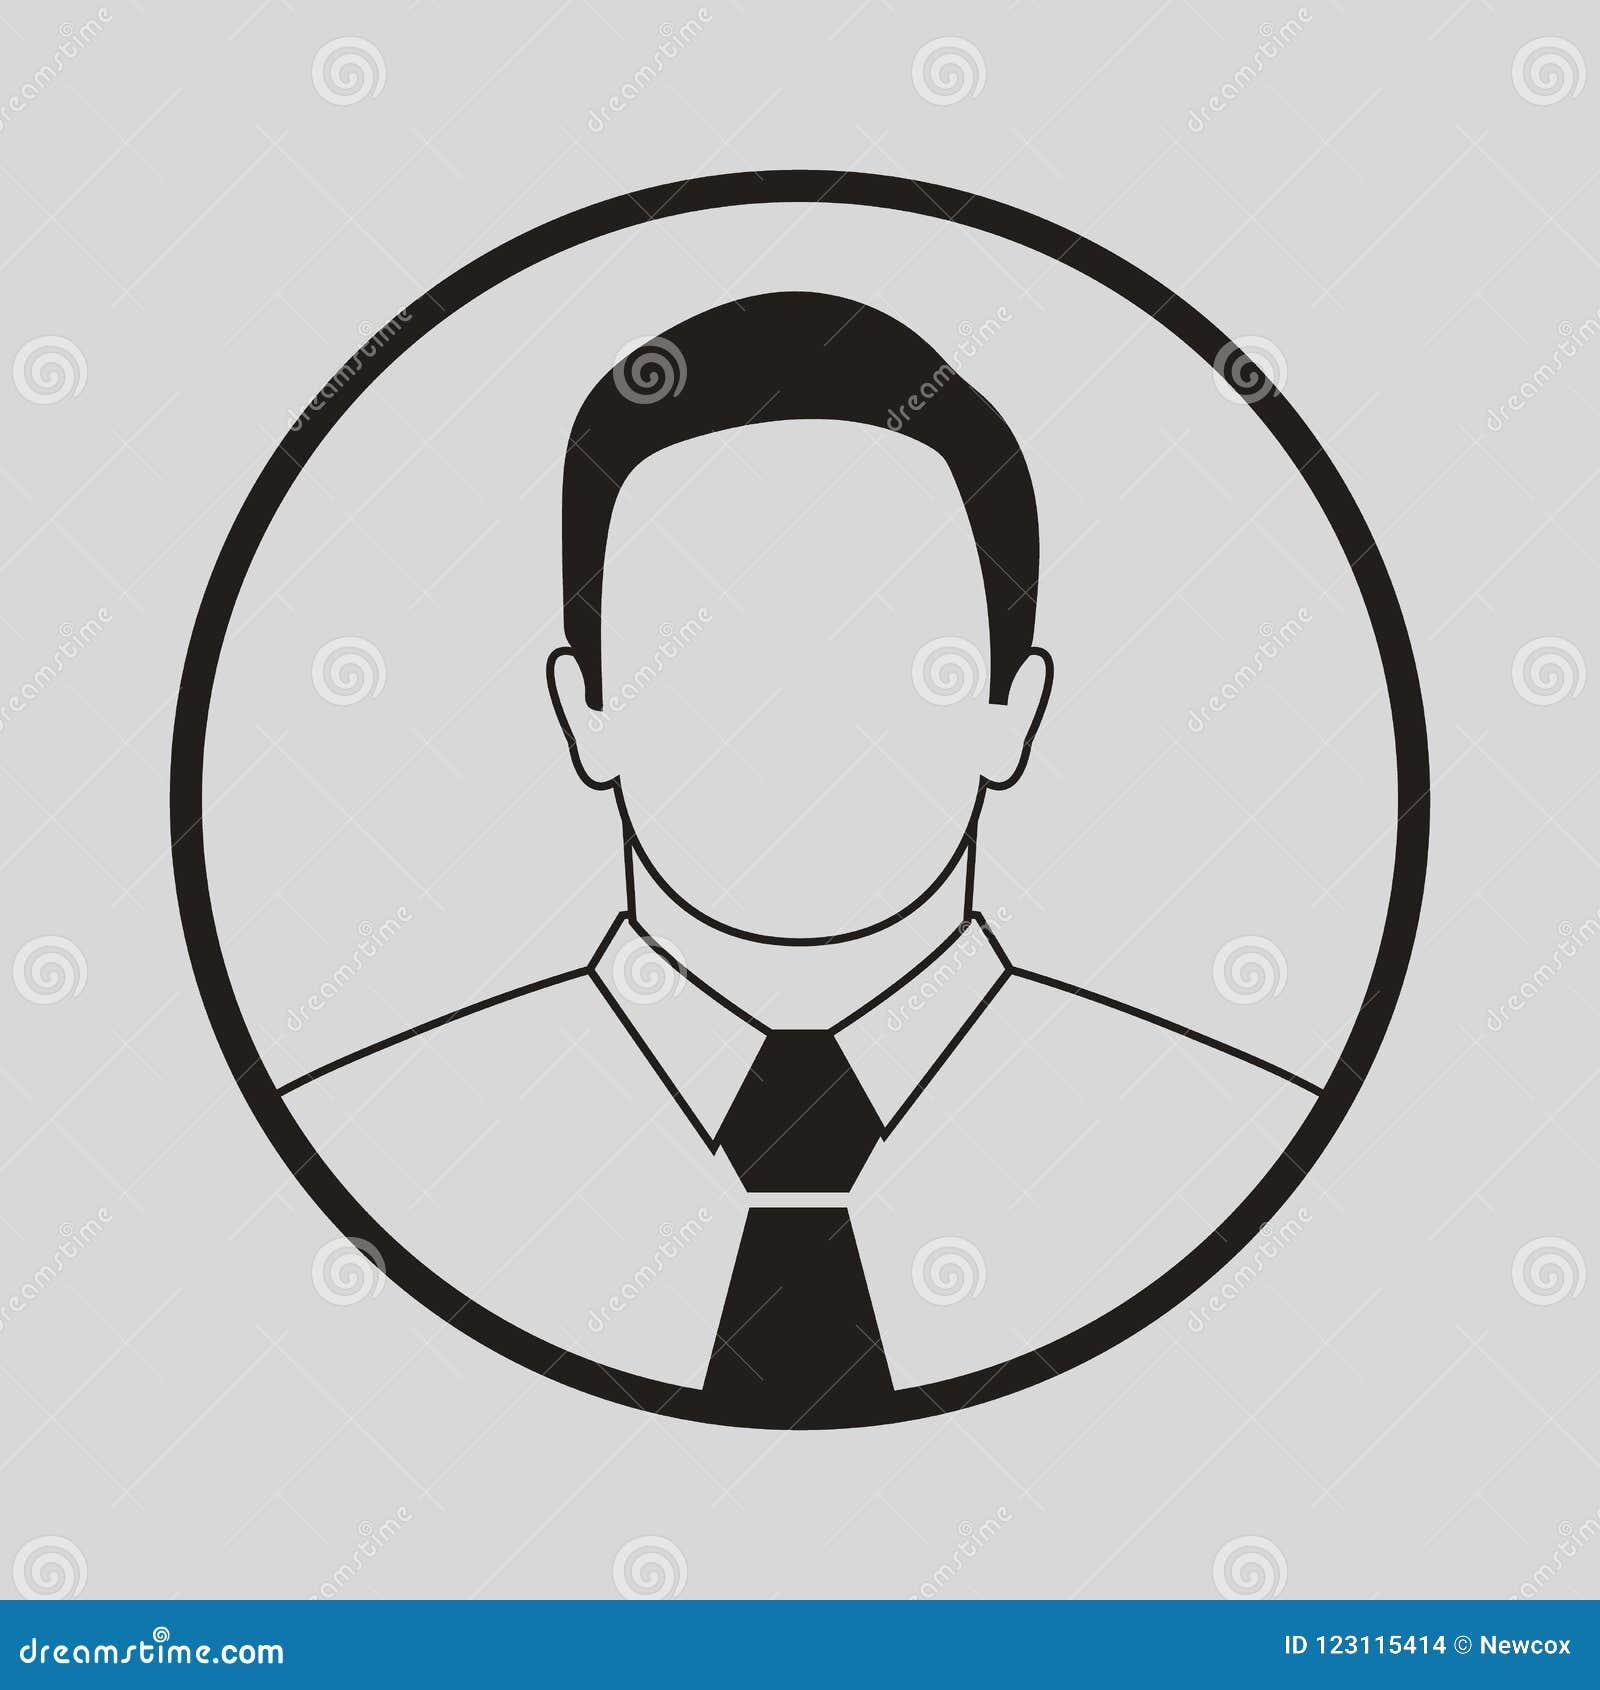 Manlig avatarsymbol med bandet